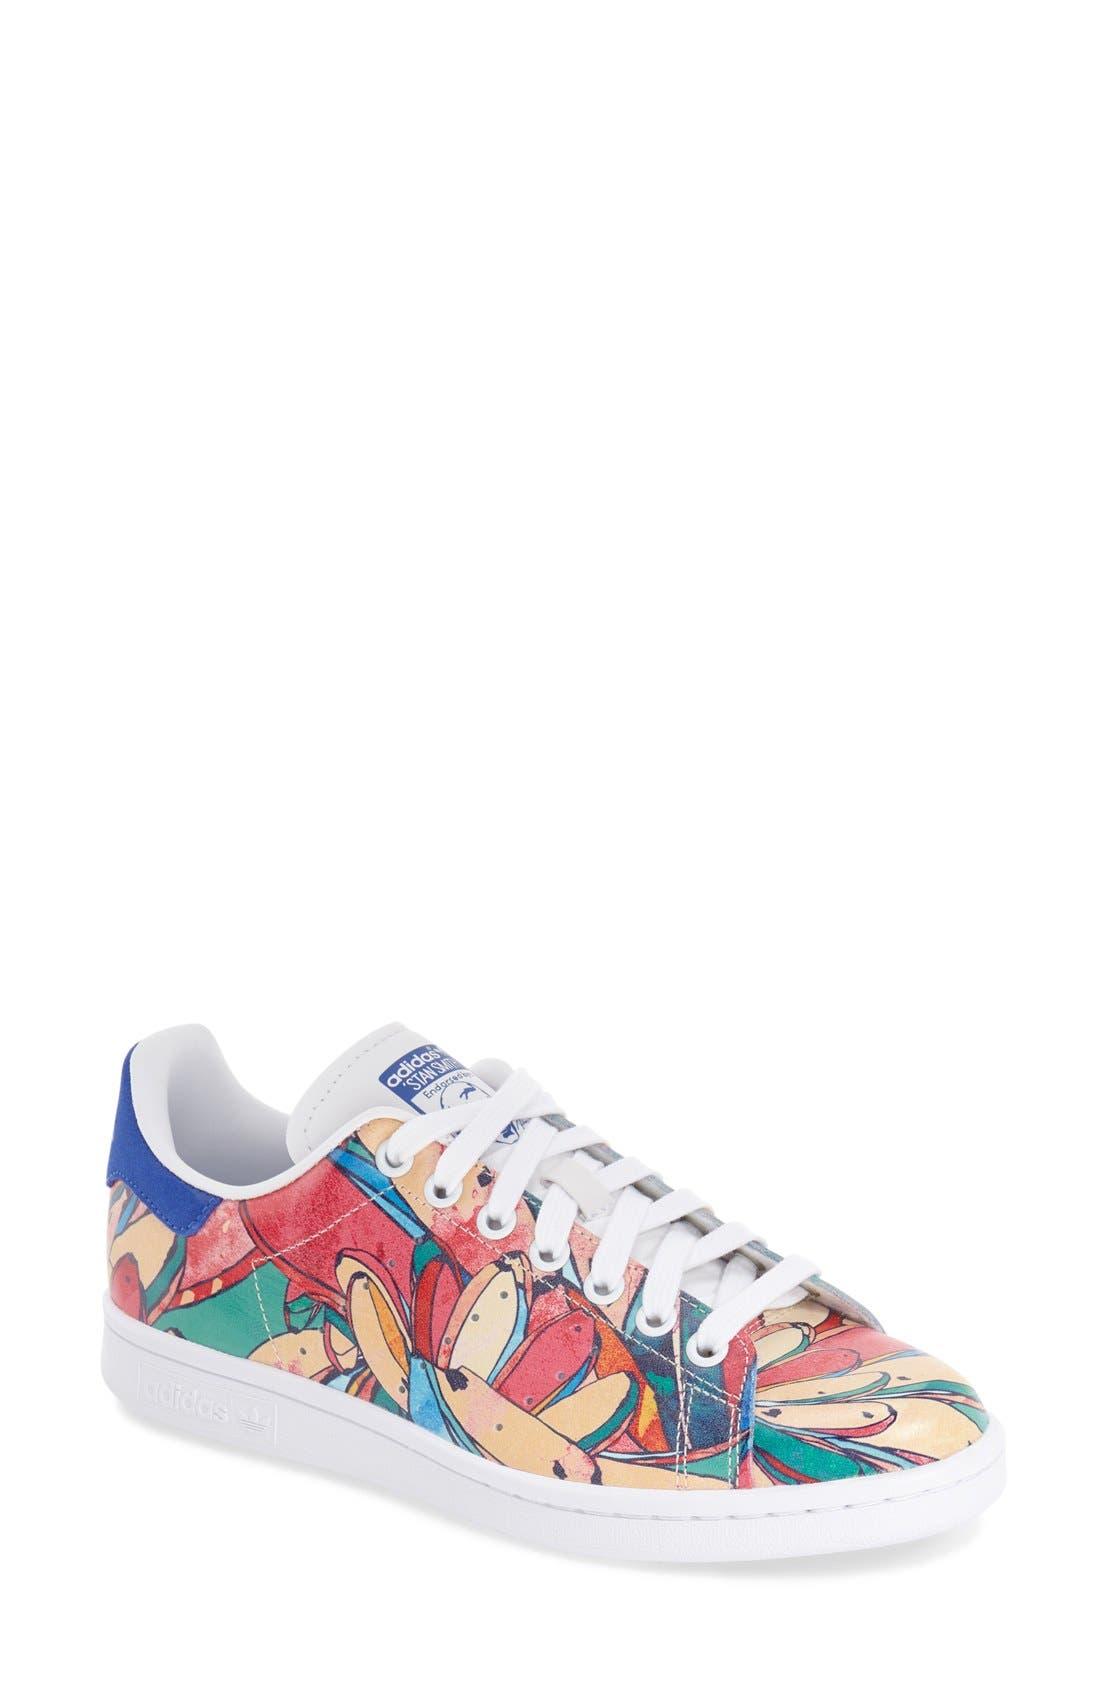 Alternate Image 1 Selected - adidas x The FARM Company 'Stan Smith' Sneaker (Women)